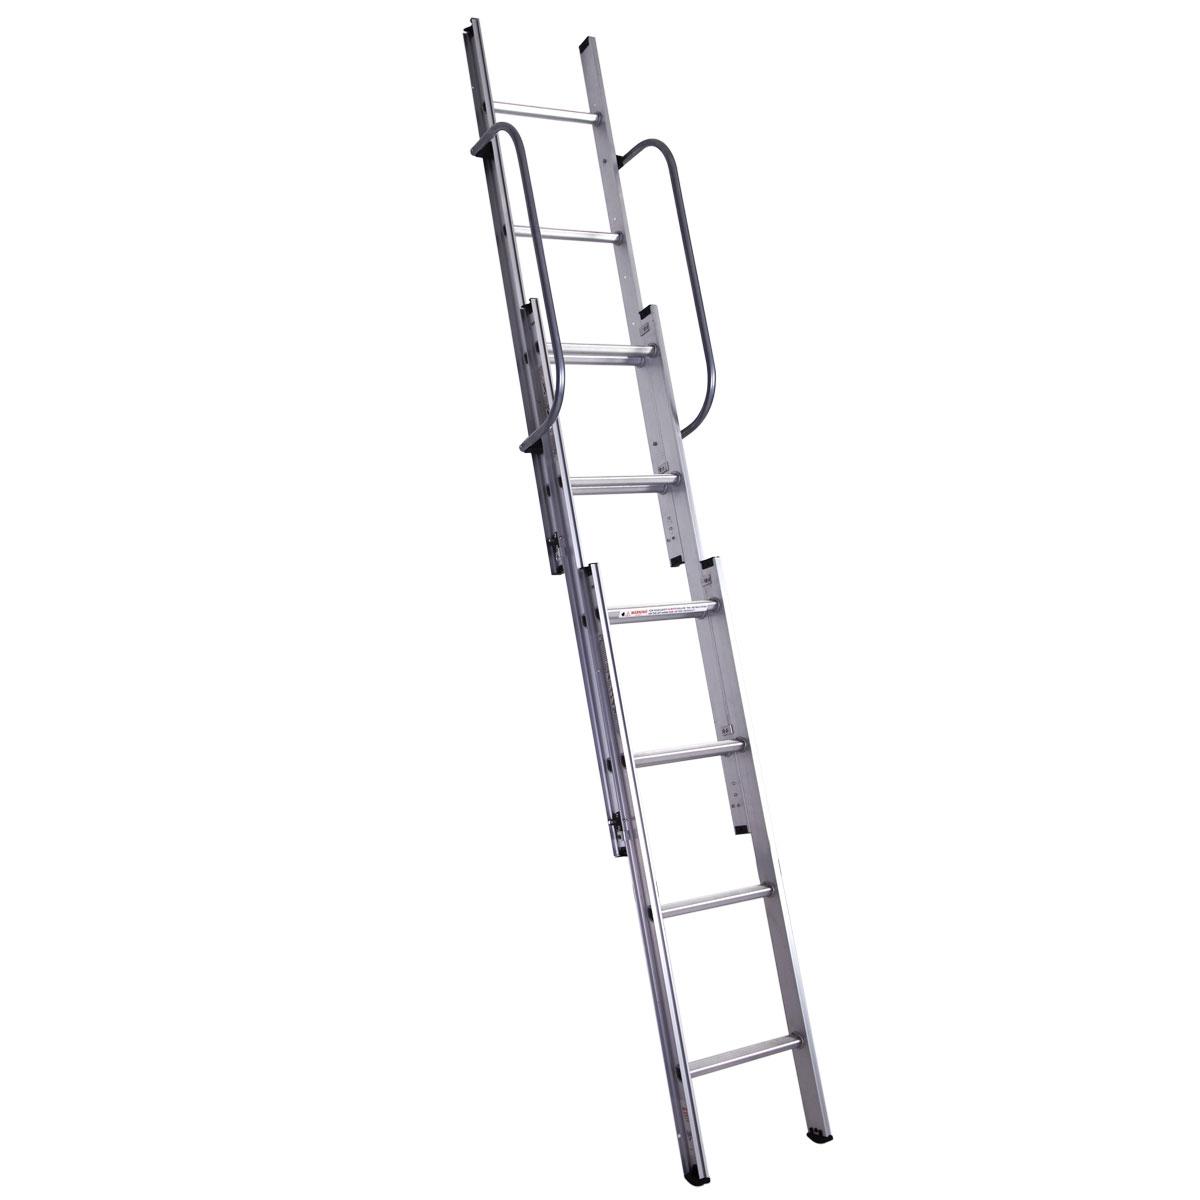 Aluminium Folding Loft Ladder Telescopic 3 Sections 3 1m